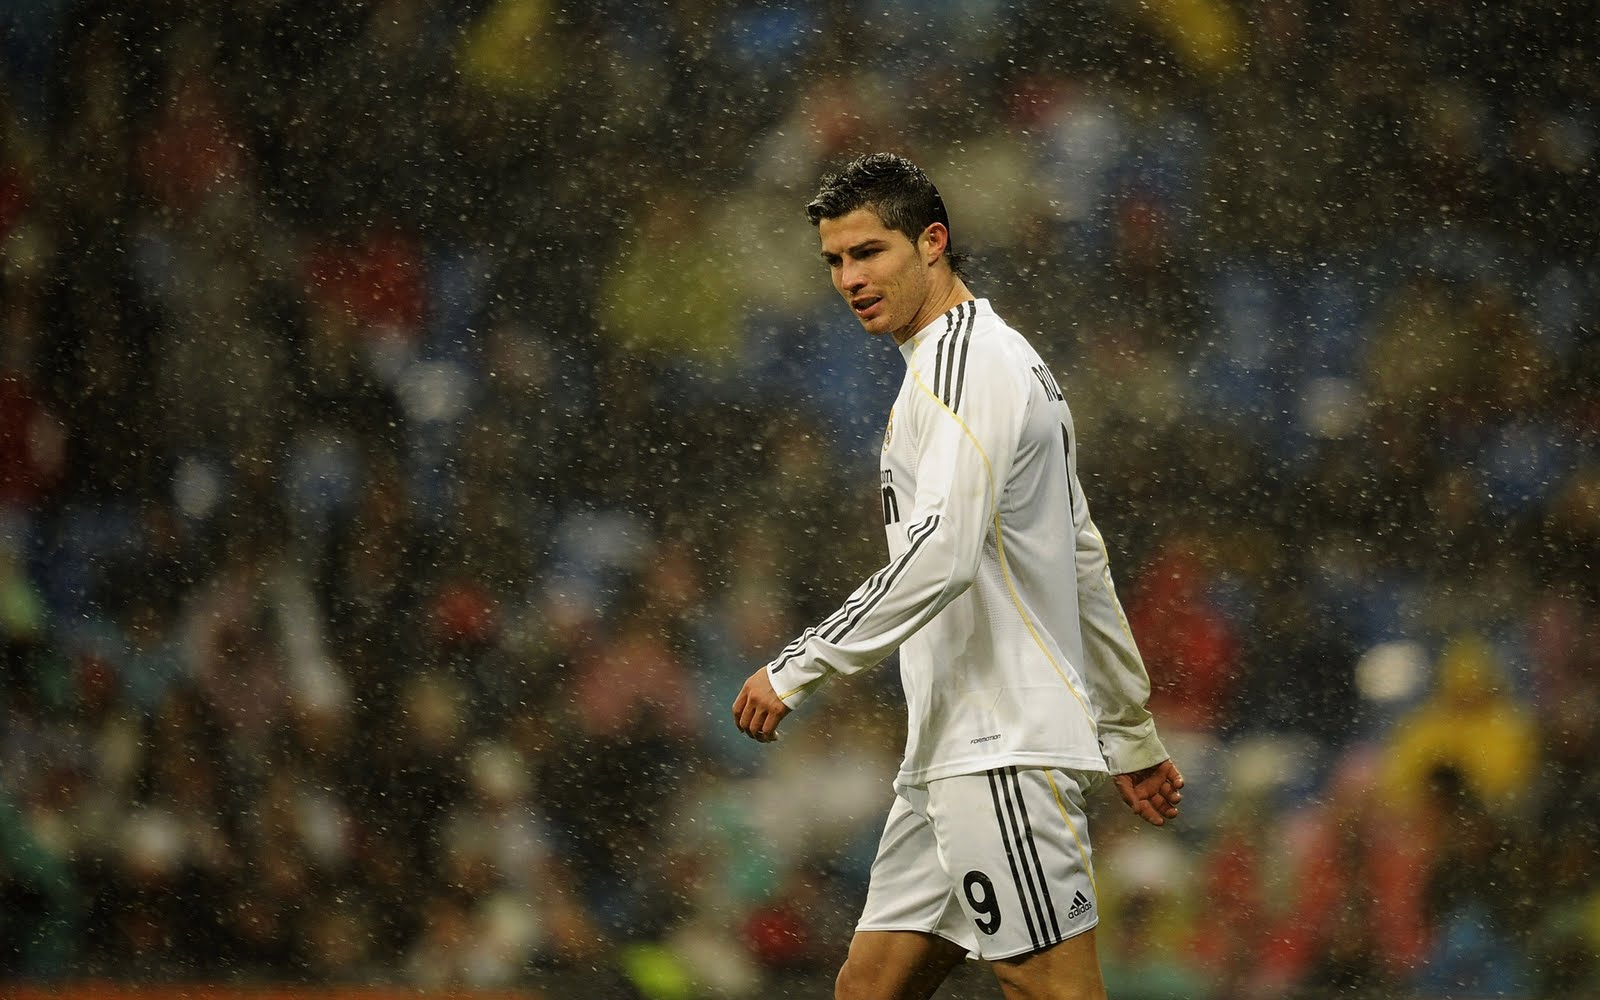 Cristiano Ronaldo Playing HD Wallpapers